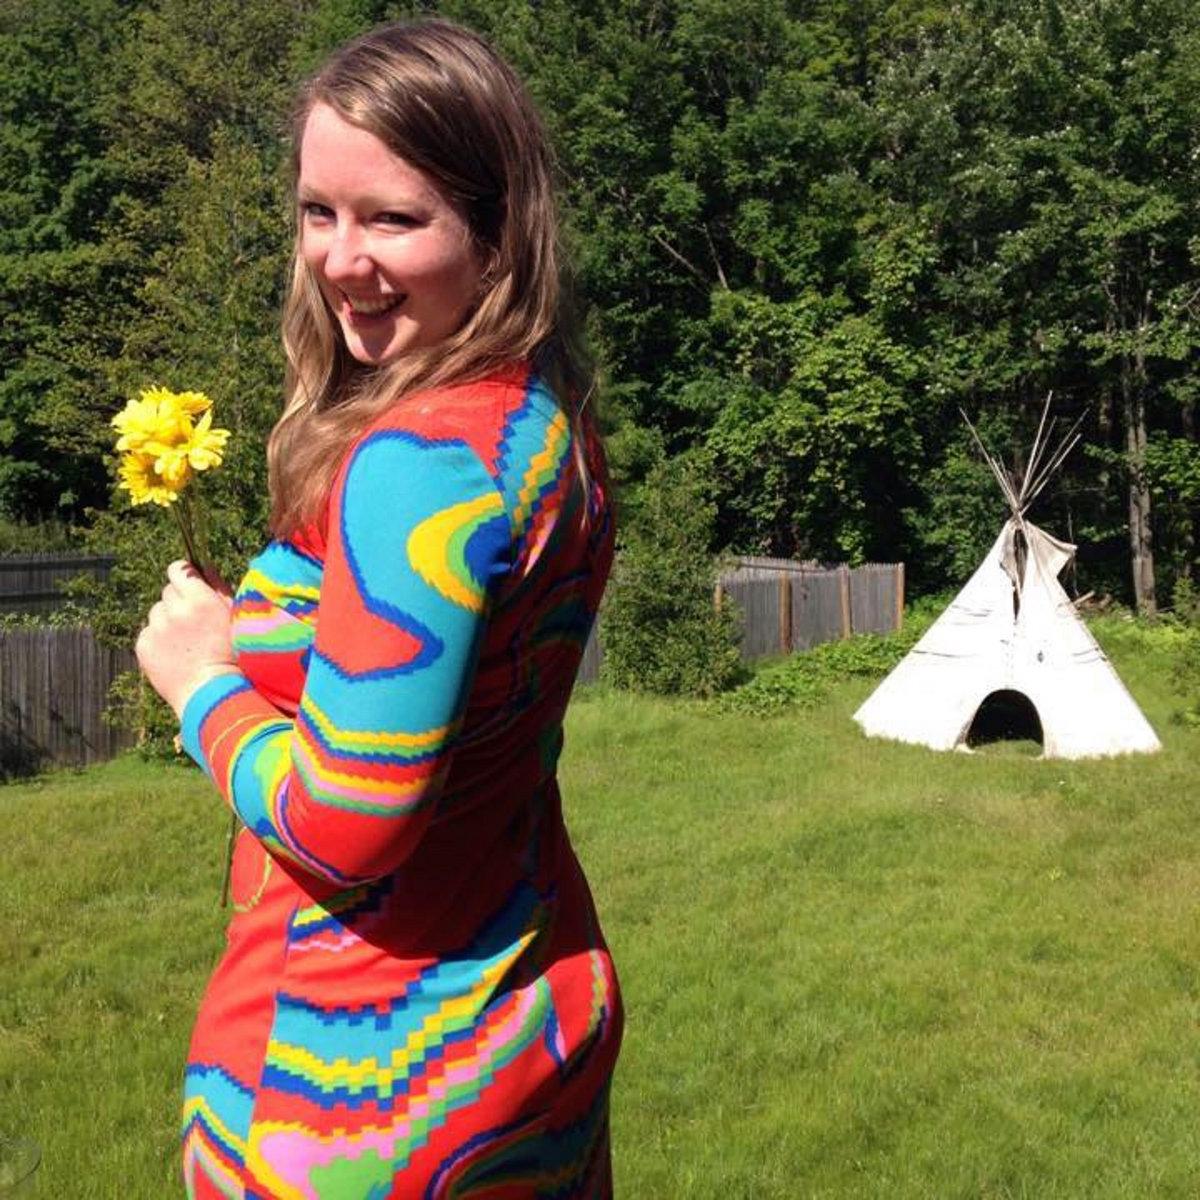 Cynthia Bailey nudes (81 photos), Tits, Leaked, Selfie, underwear 2017